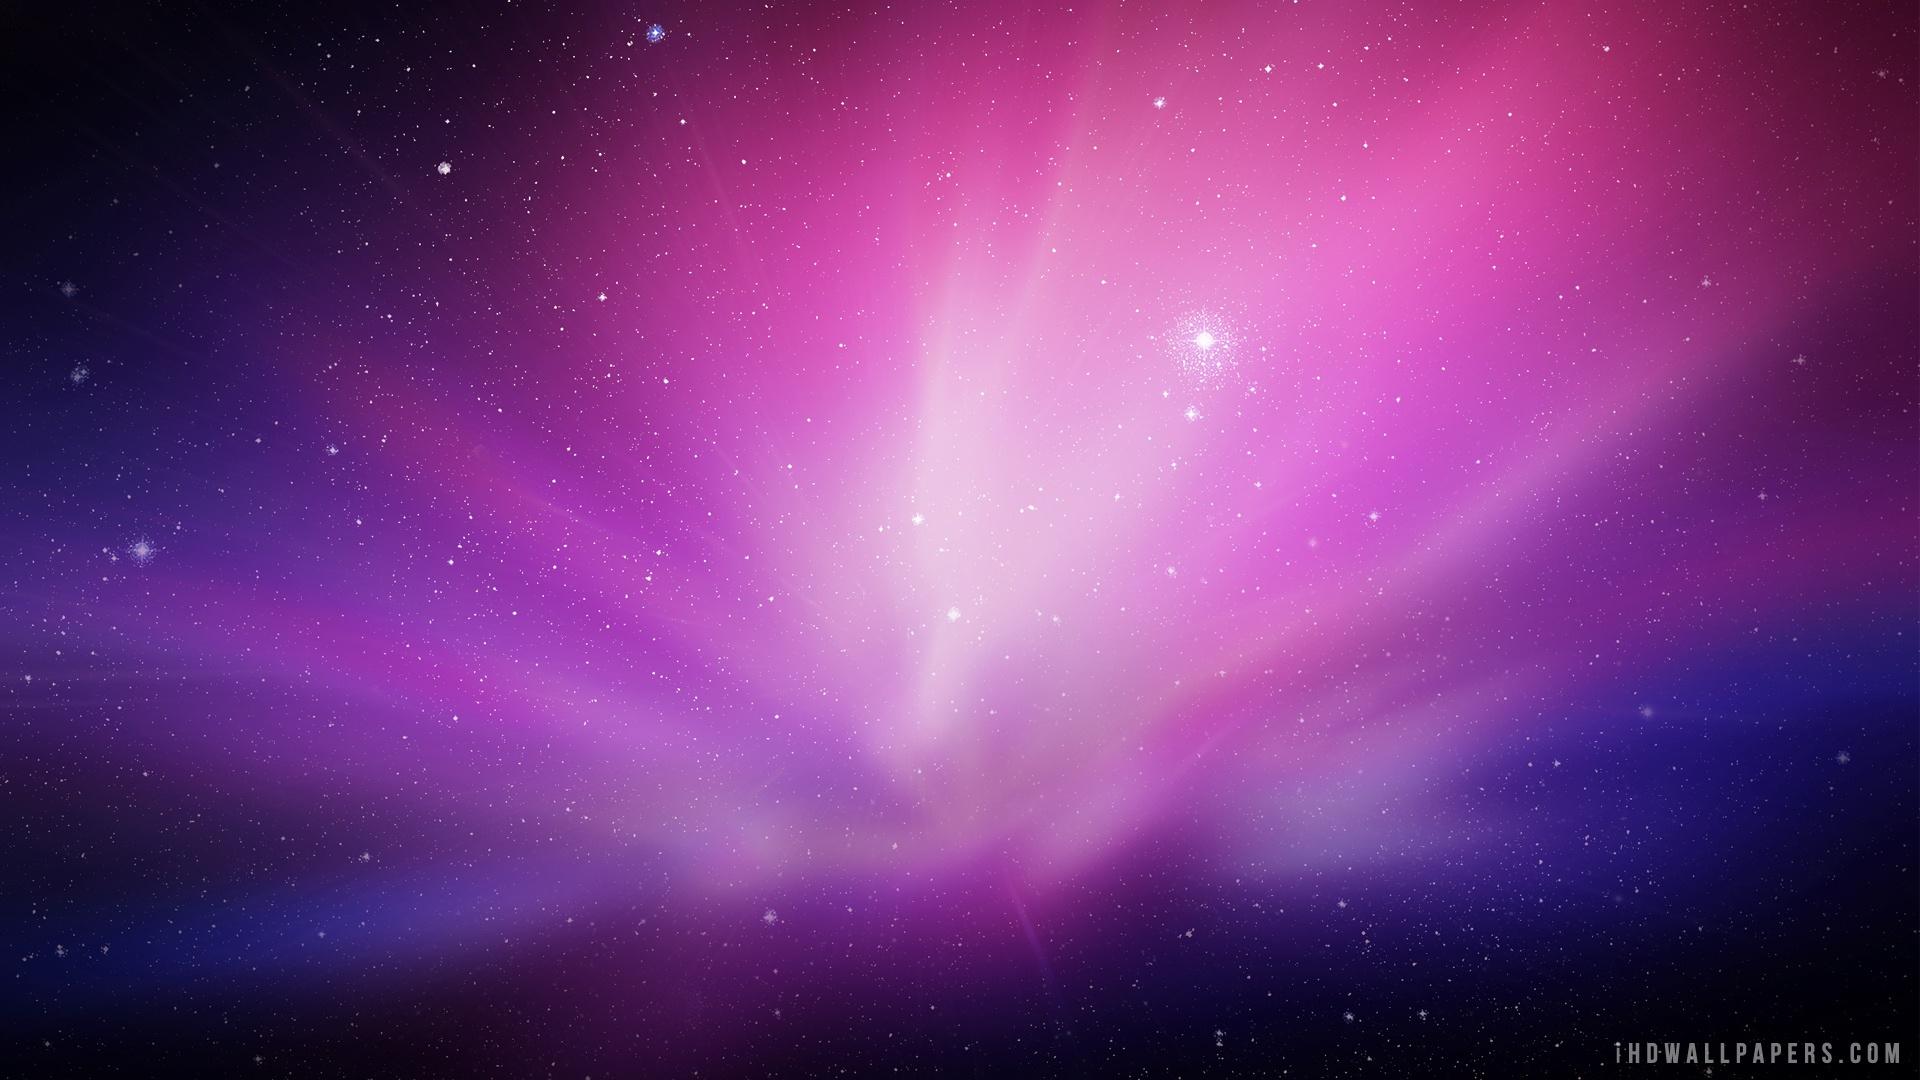 Mac Os X 10.6 0 Snow Leopard Download